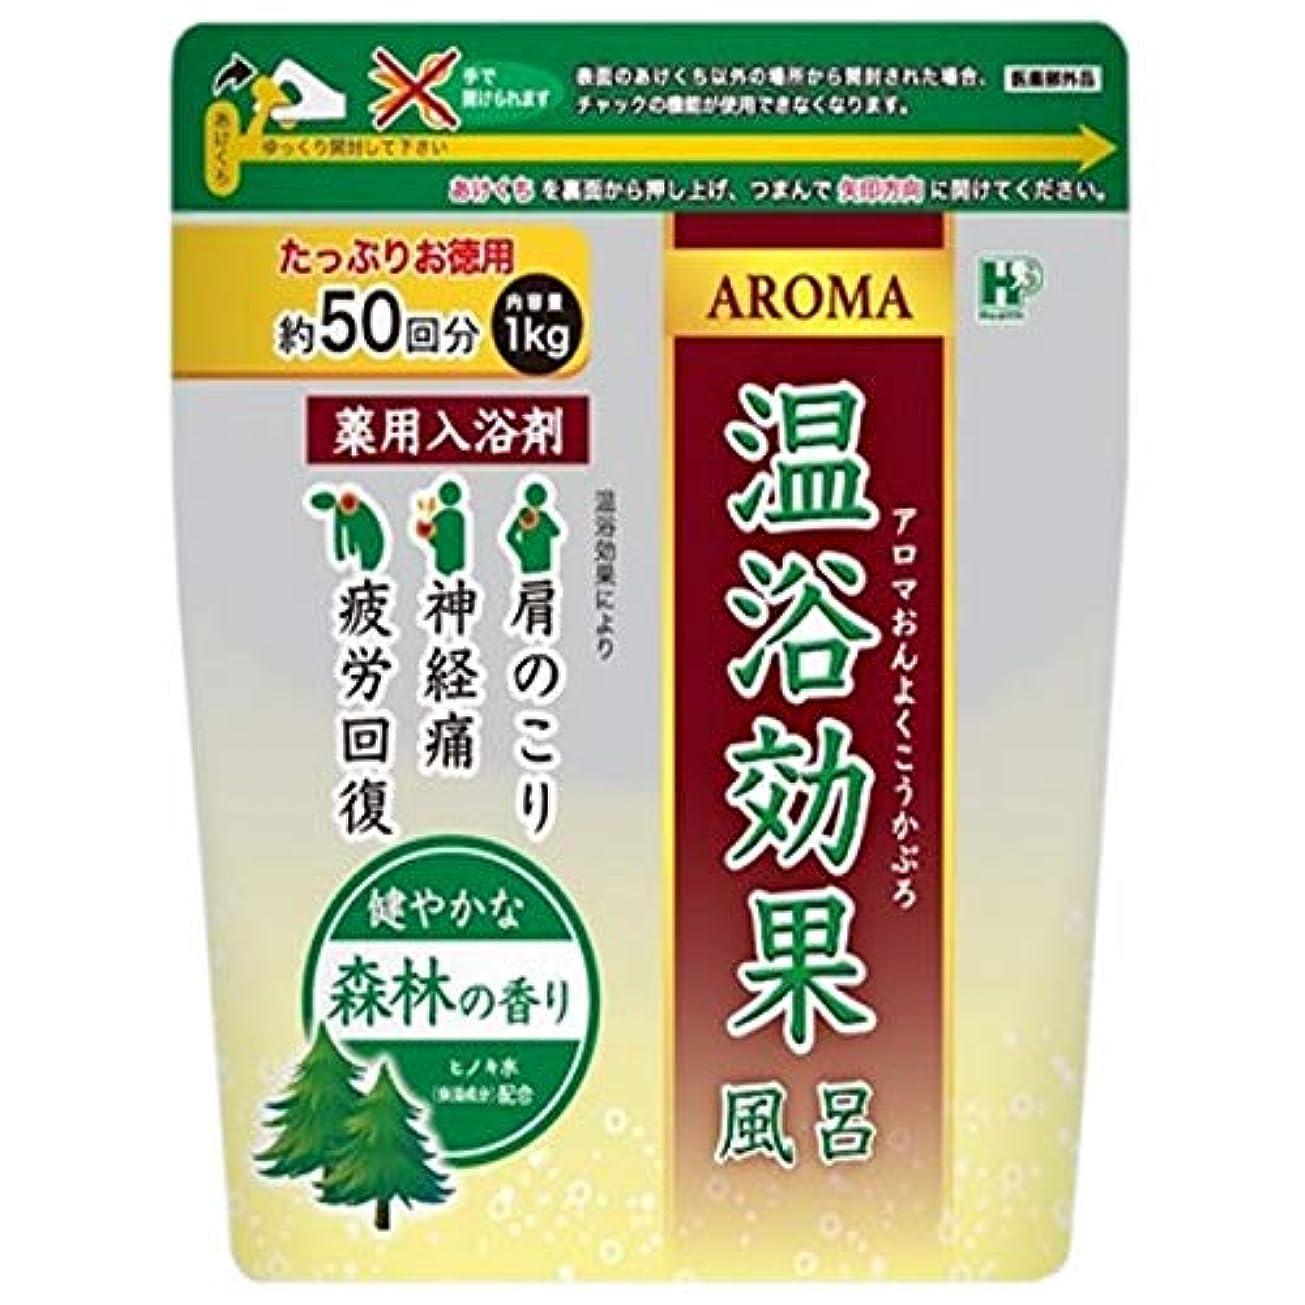 交通忠実なドール薬用入浴剤 アロマ温浴効果風呂 森林 1kg×10袋入